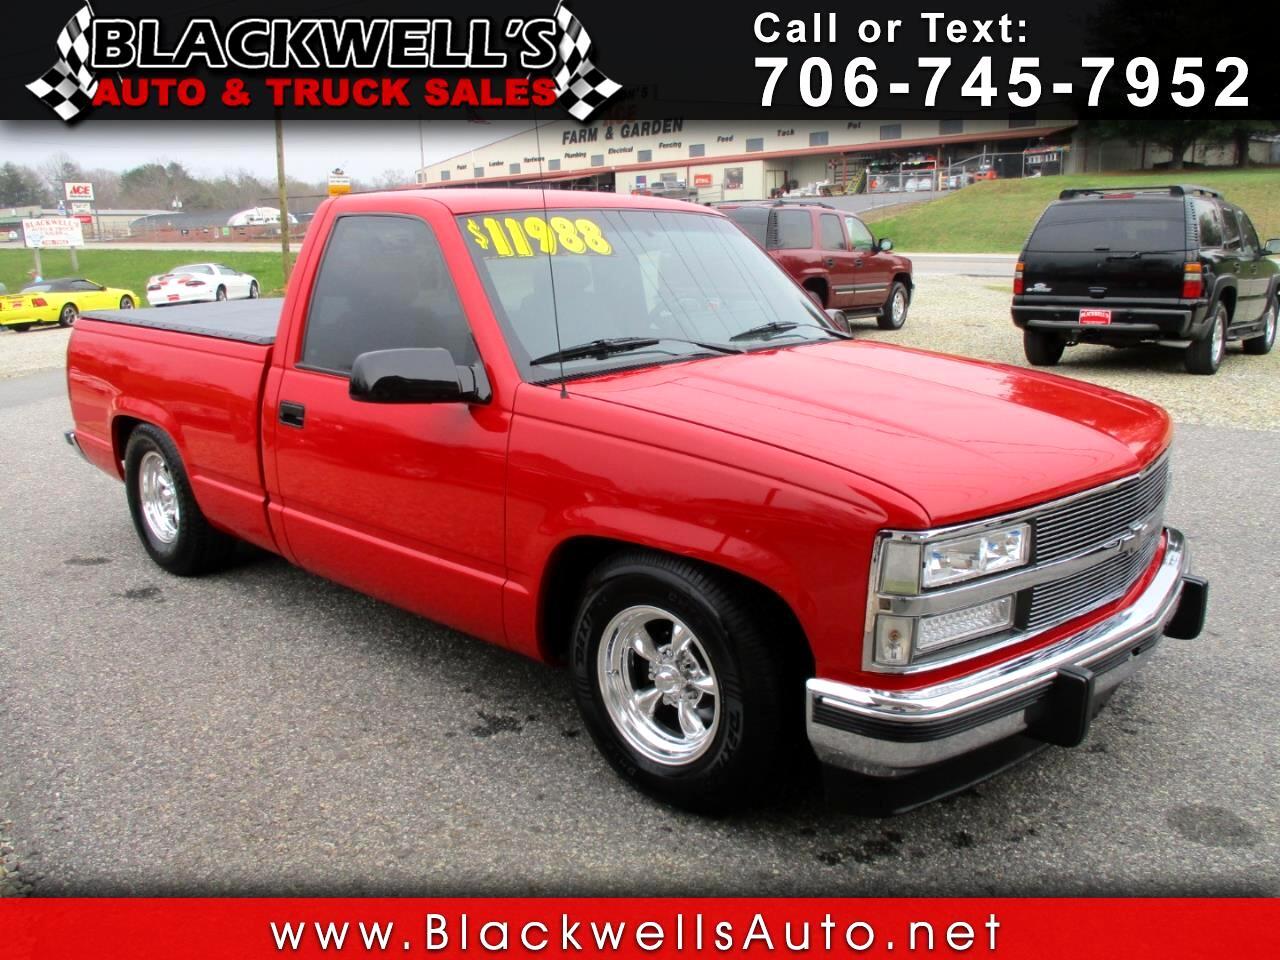 1988 Chevrolet 1/2 Ton Pickups Fleetside 117.5